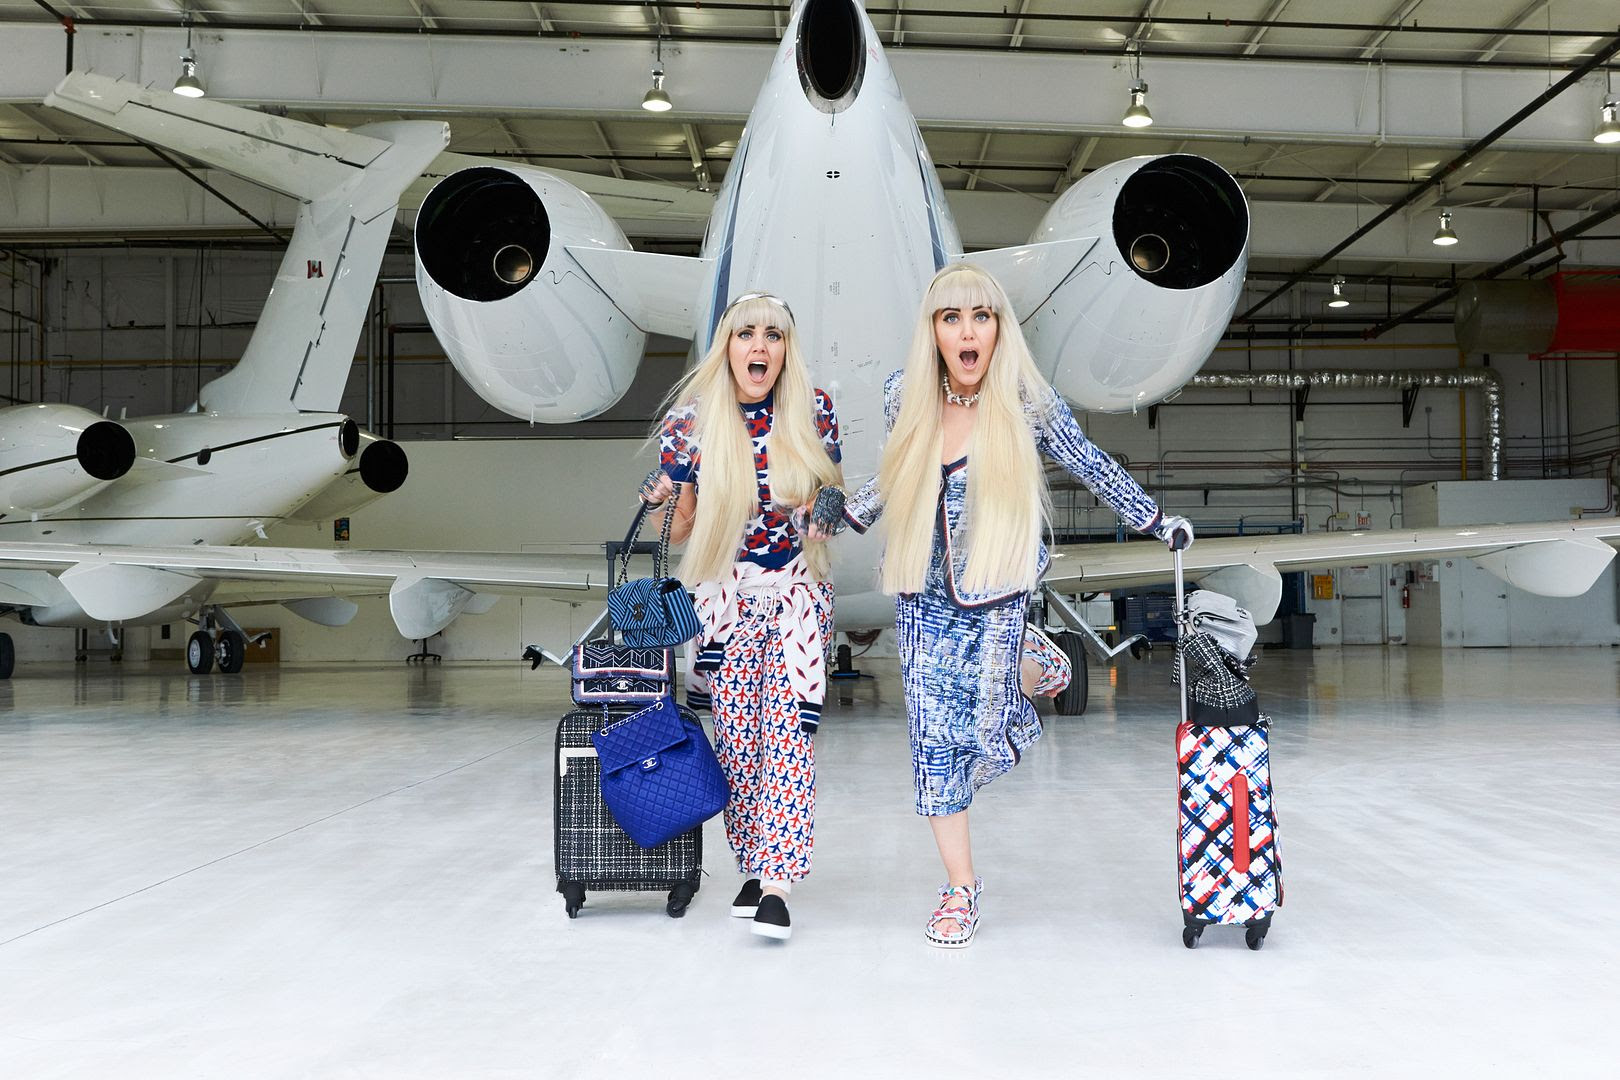 photo chanel-airlines-hangar-toronto-paris-beckermans-twins_zpse7ahidtj.jpg